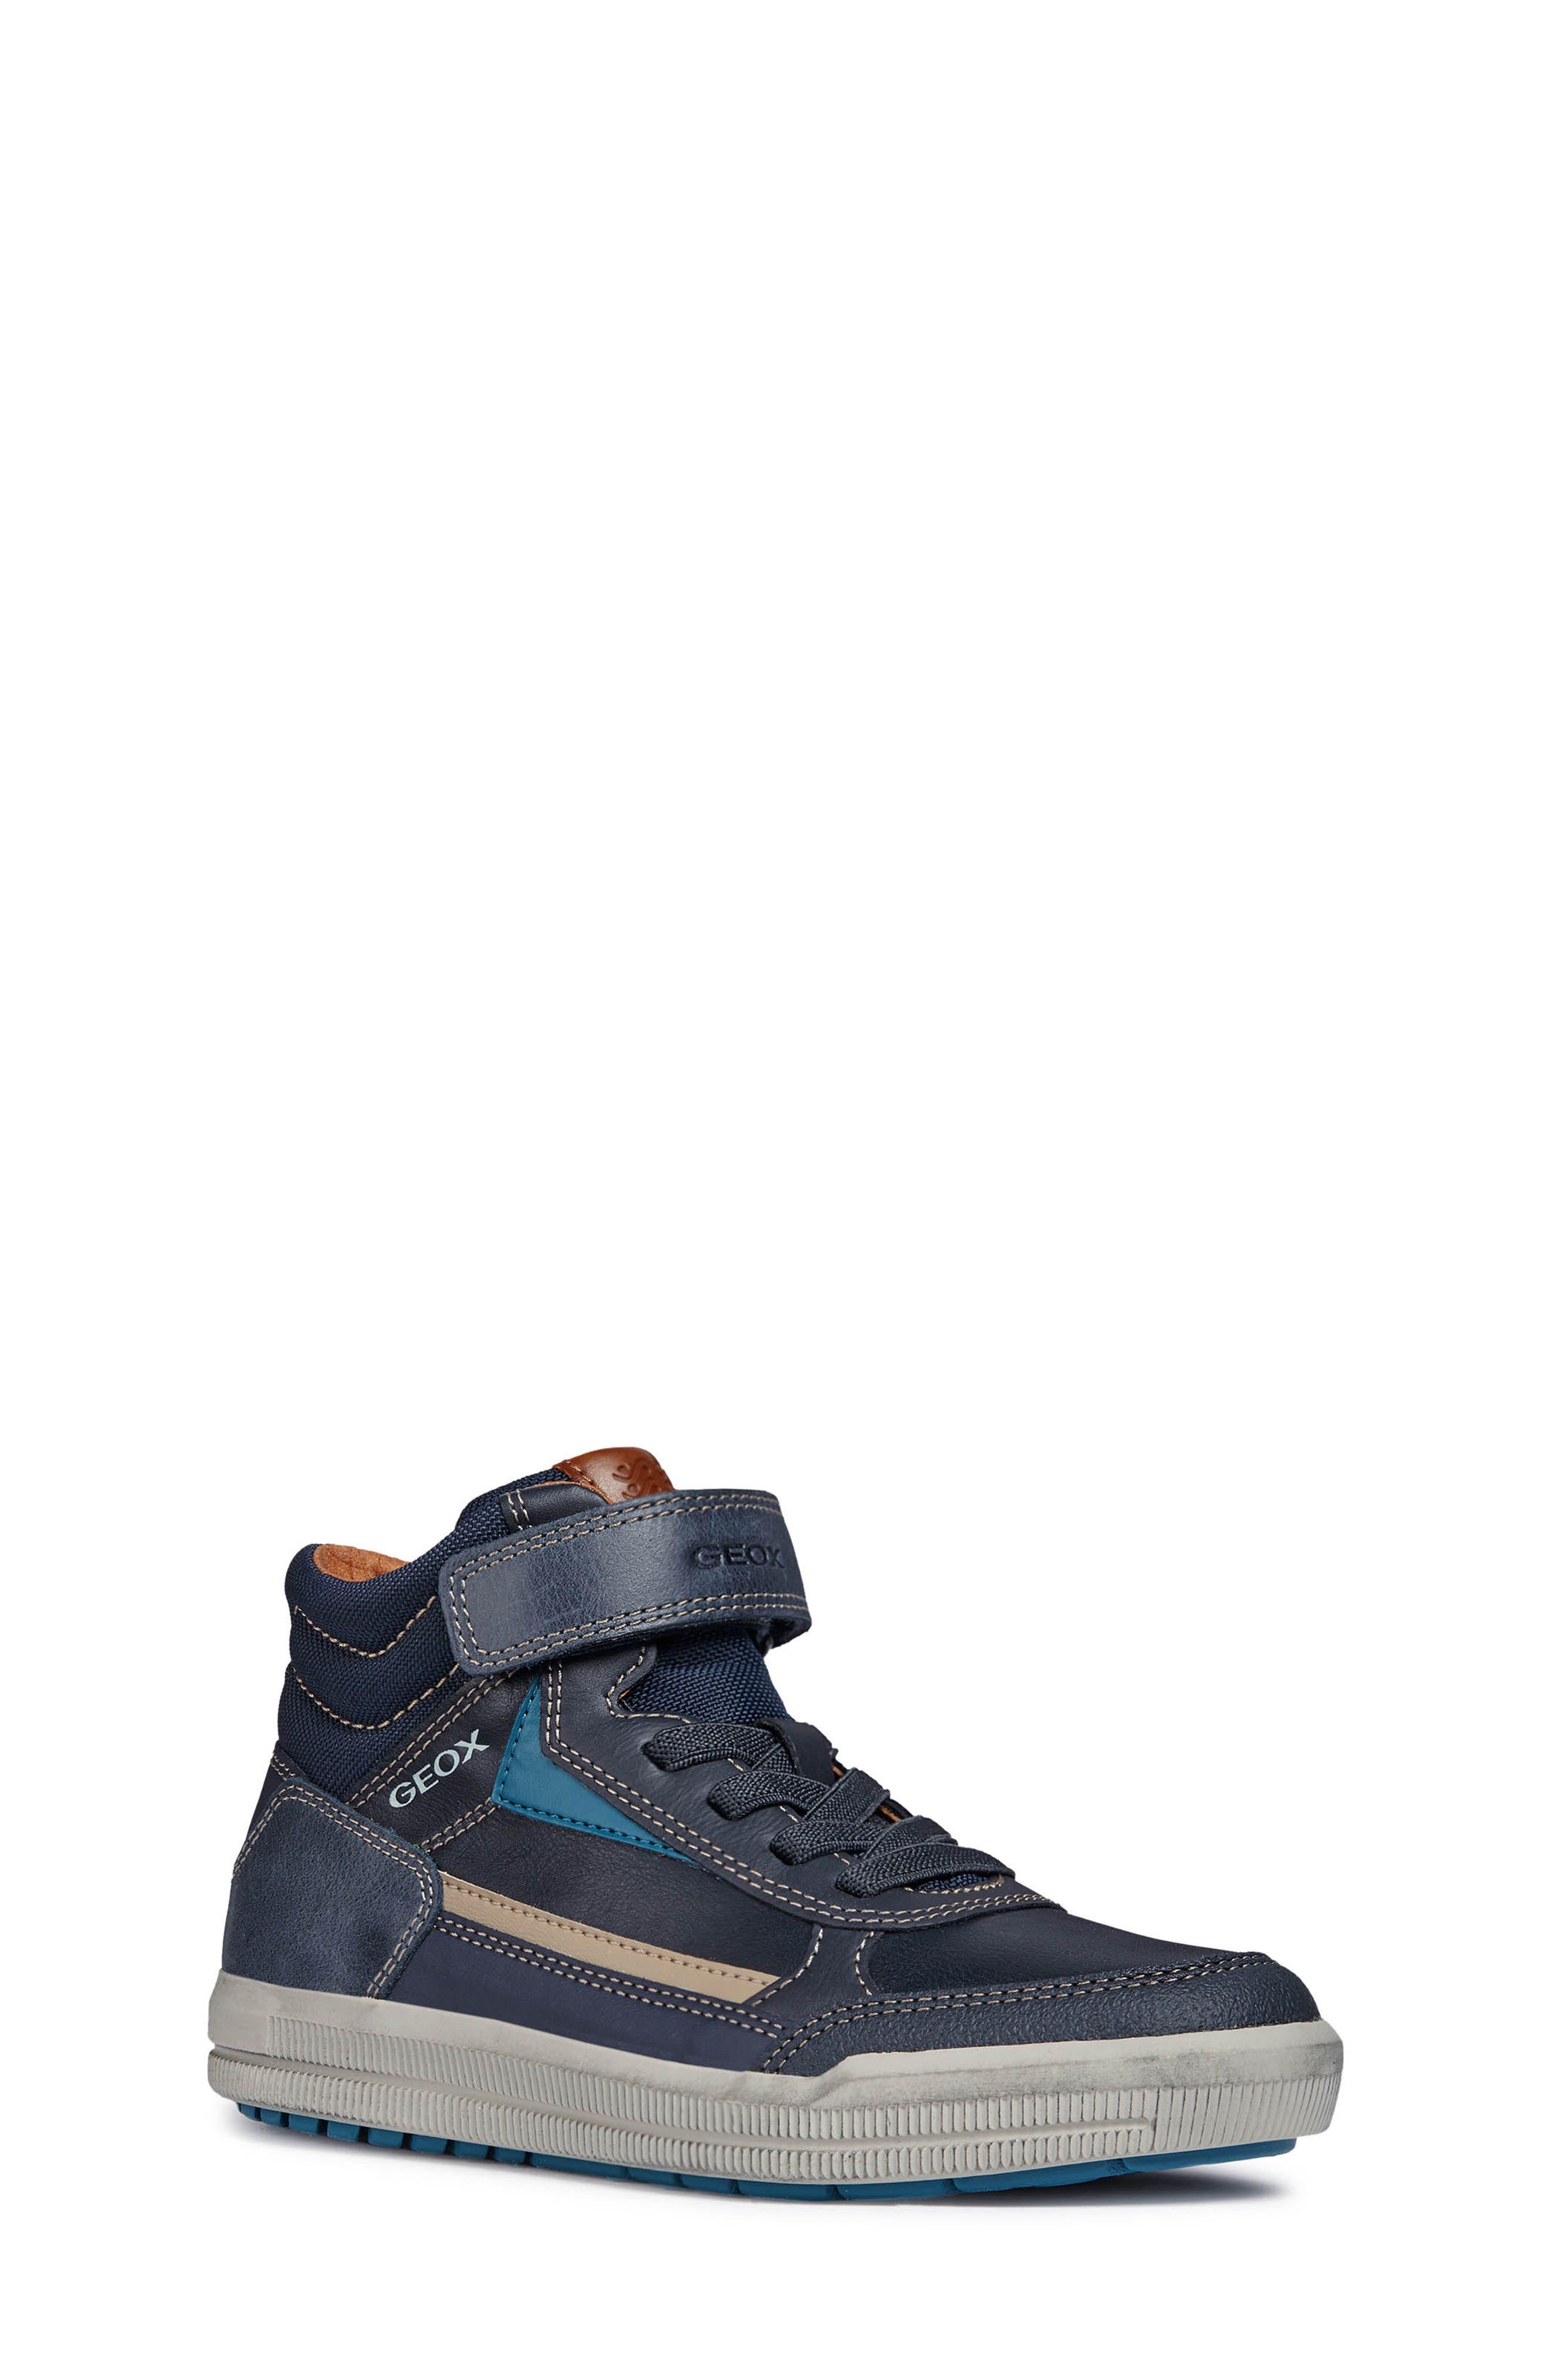 Arzach Mid Top Sneaker,                             Main thumbnail 1, color,                             Navy/Petrol